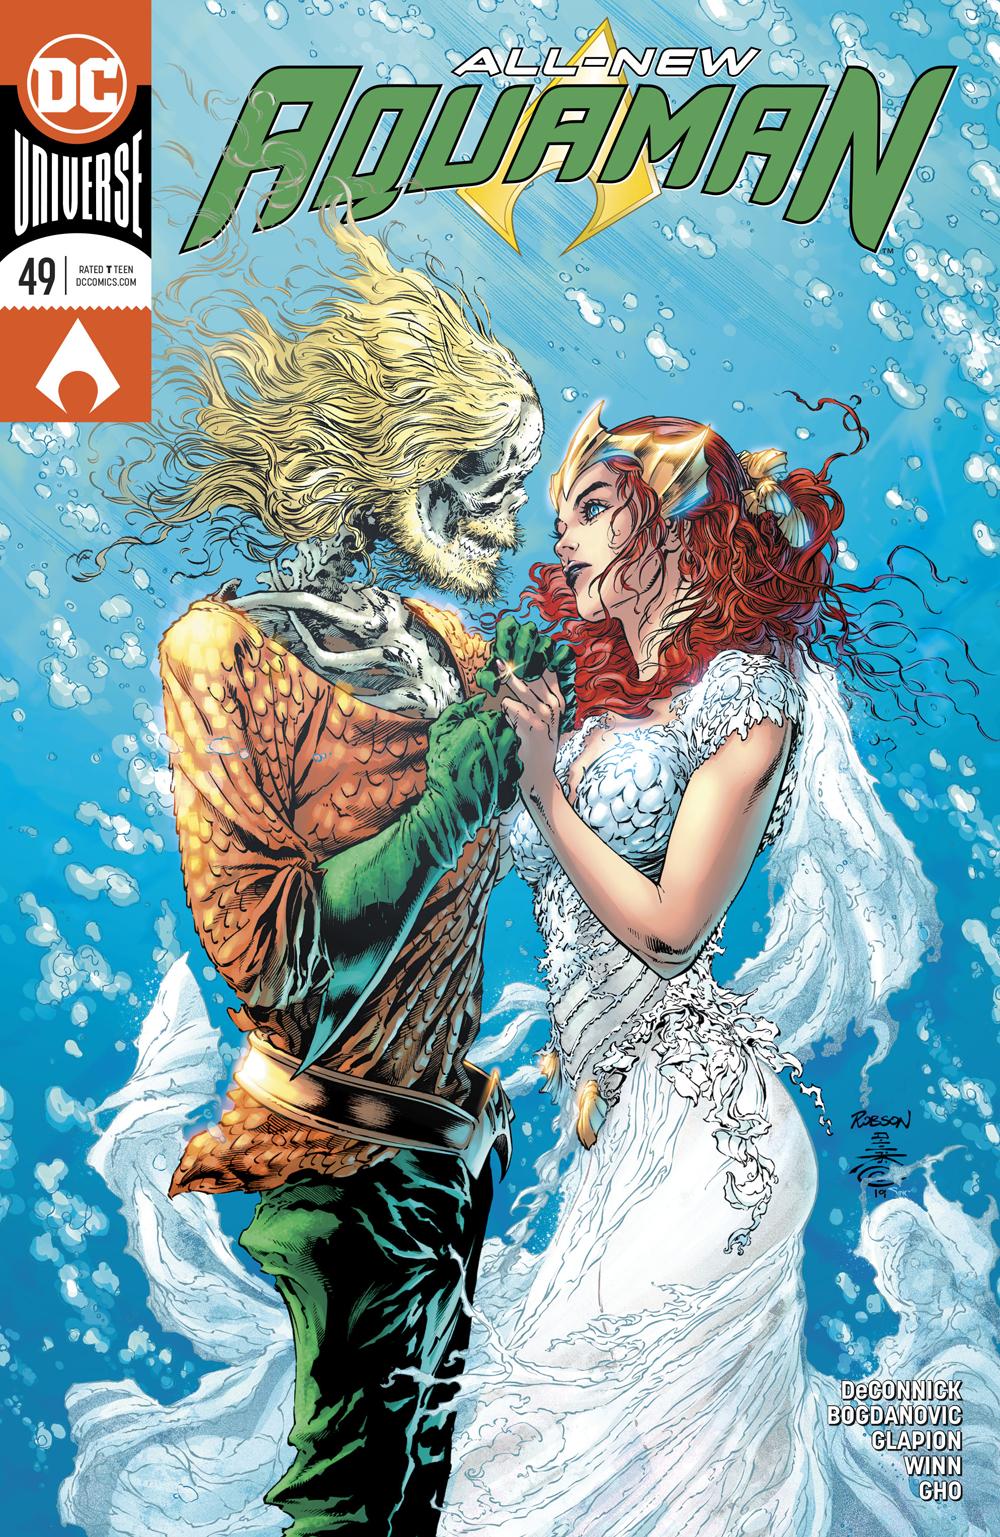 Tag 48 sur DC Earth - Forum RPG Comics 92246e7a852f41f59613b29177823d9516dadf86